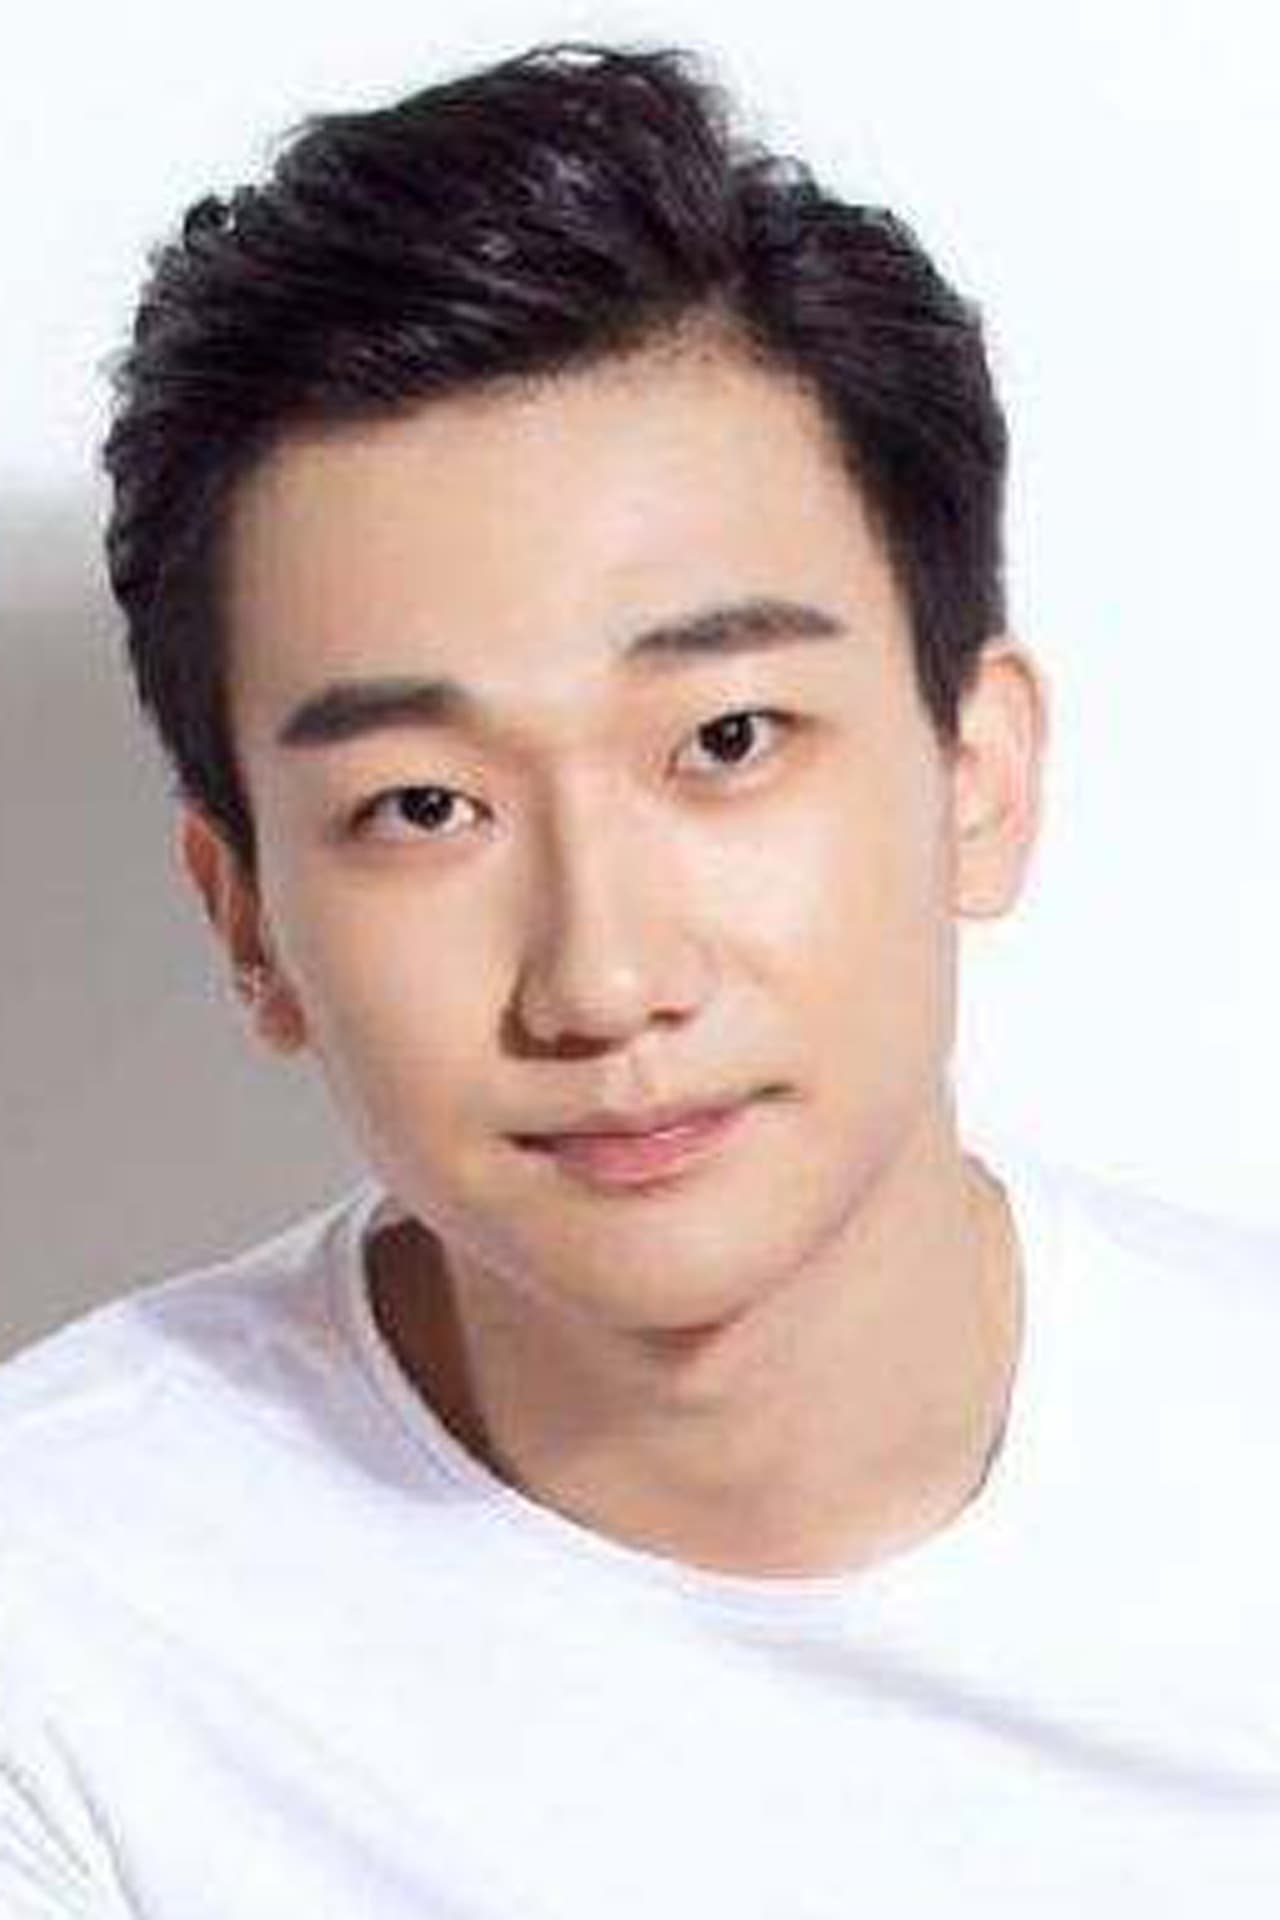 Wu Haochen